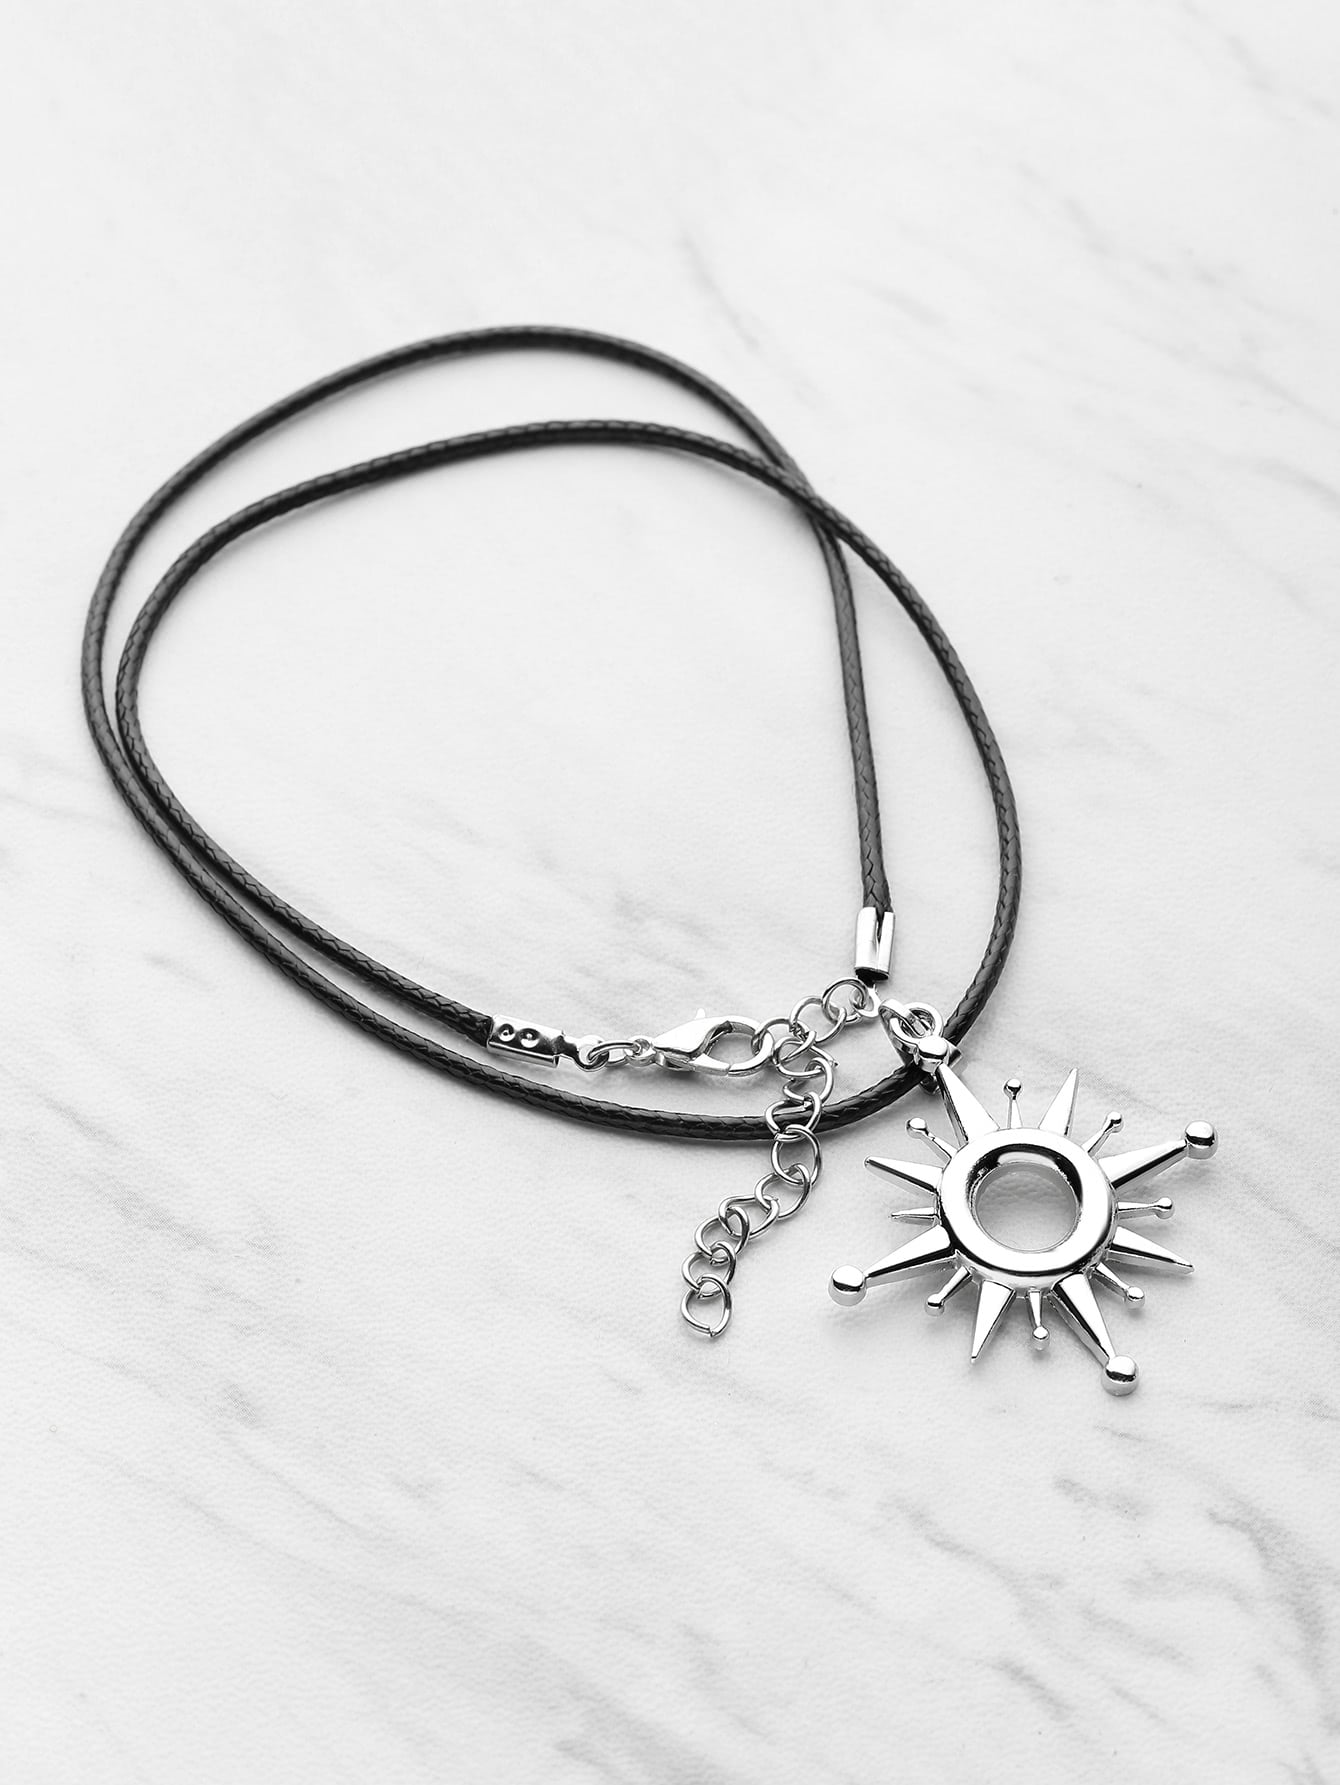 Sun Shaped Pendant Necklace